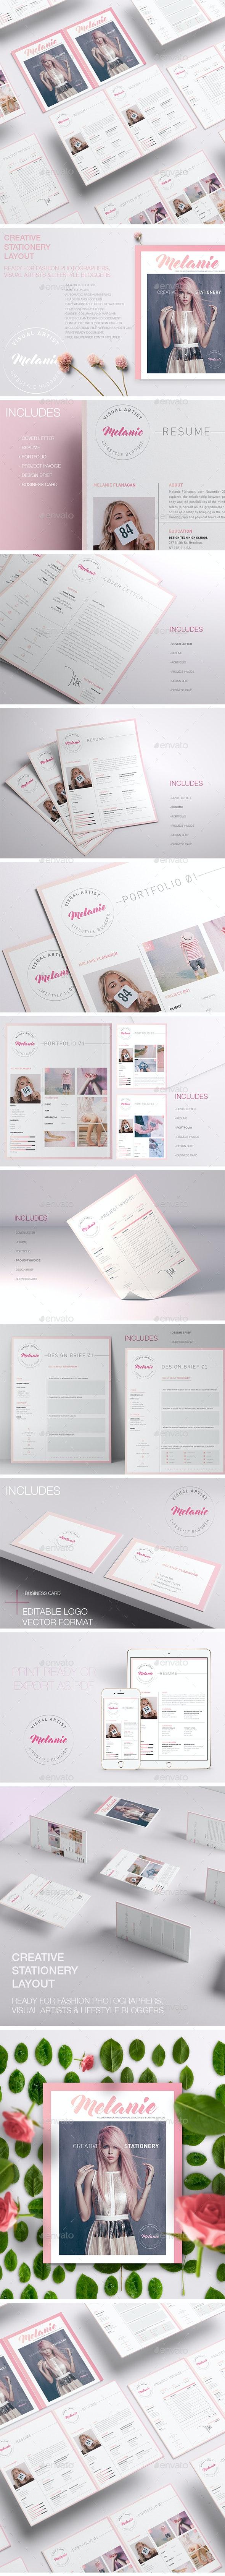 Melanie - Creative Stationery - Stationery Print Templates